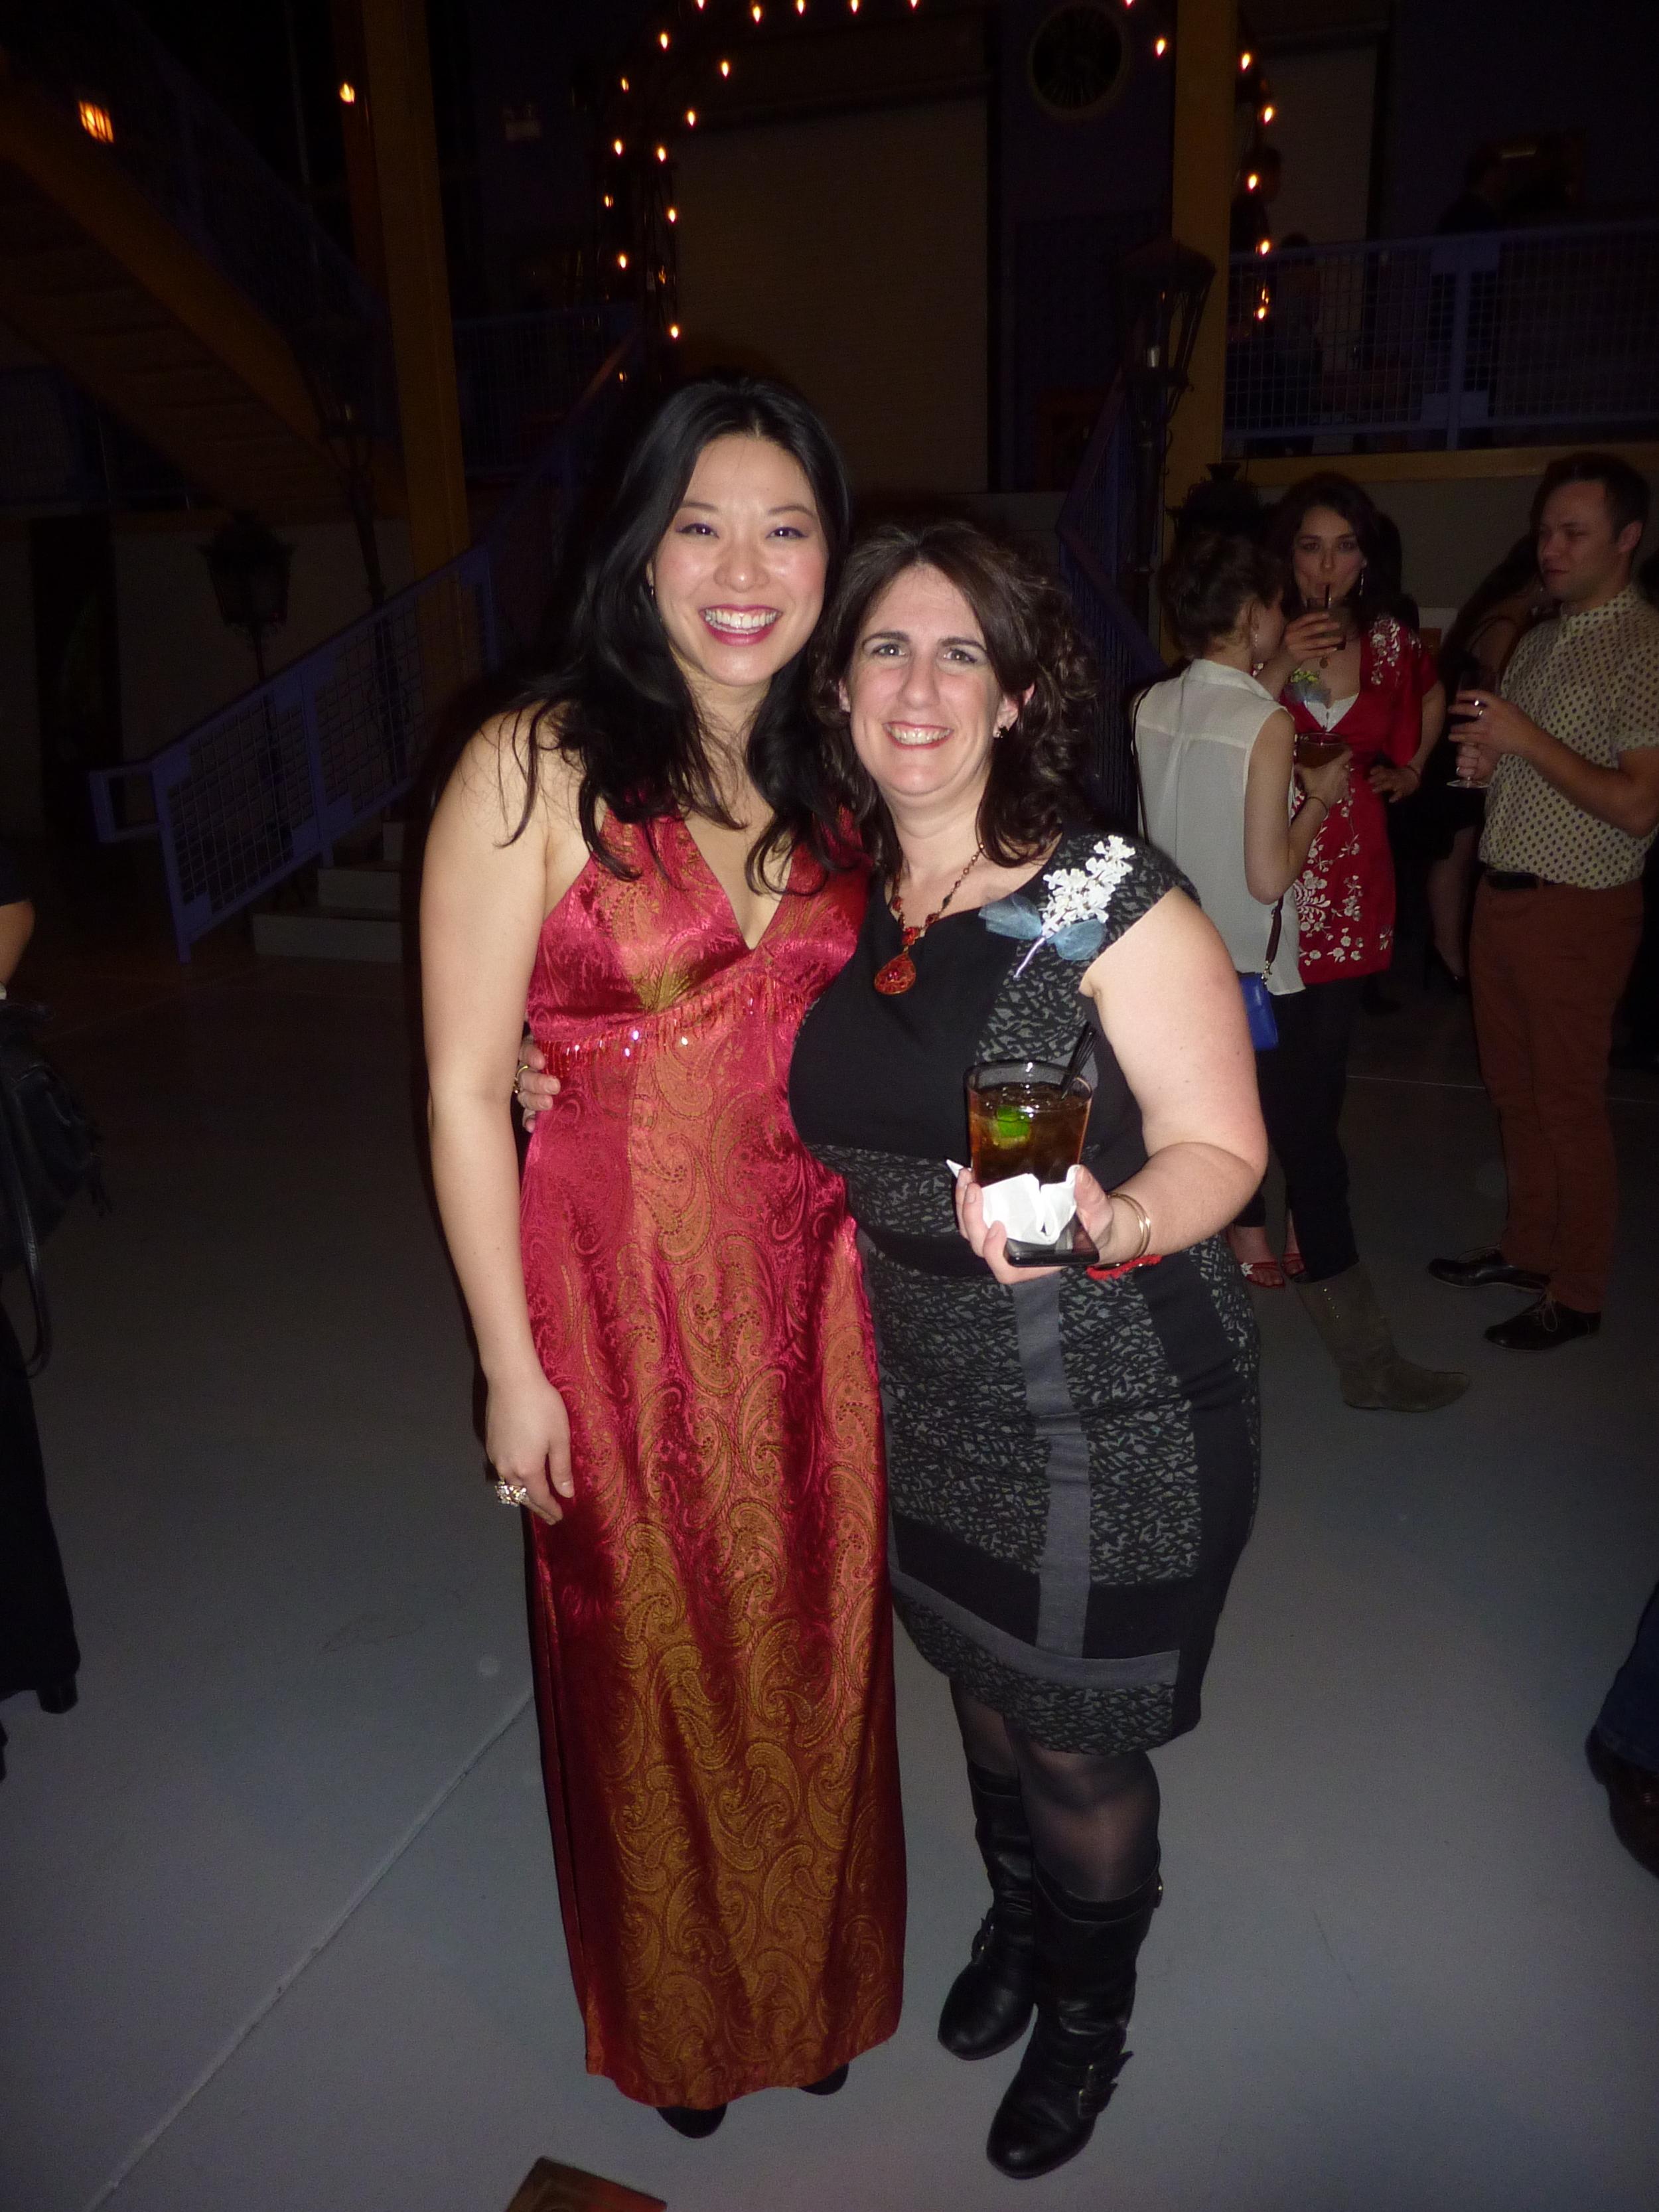 Halcyon co-founder Jenn Adams and me